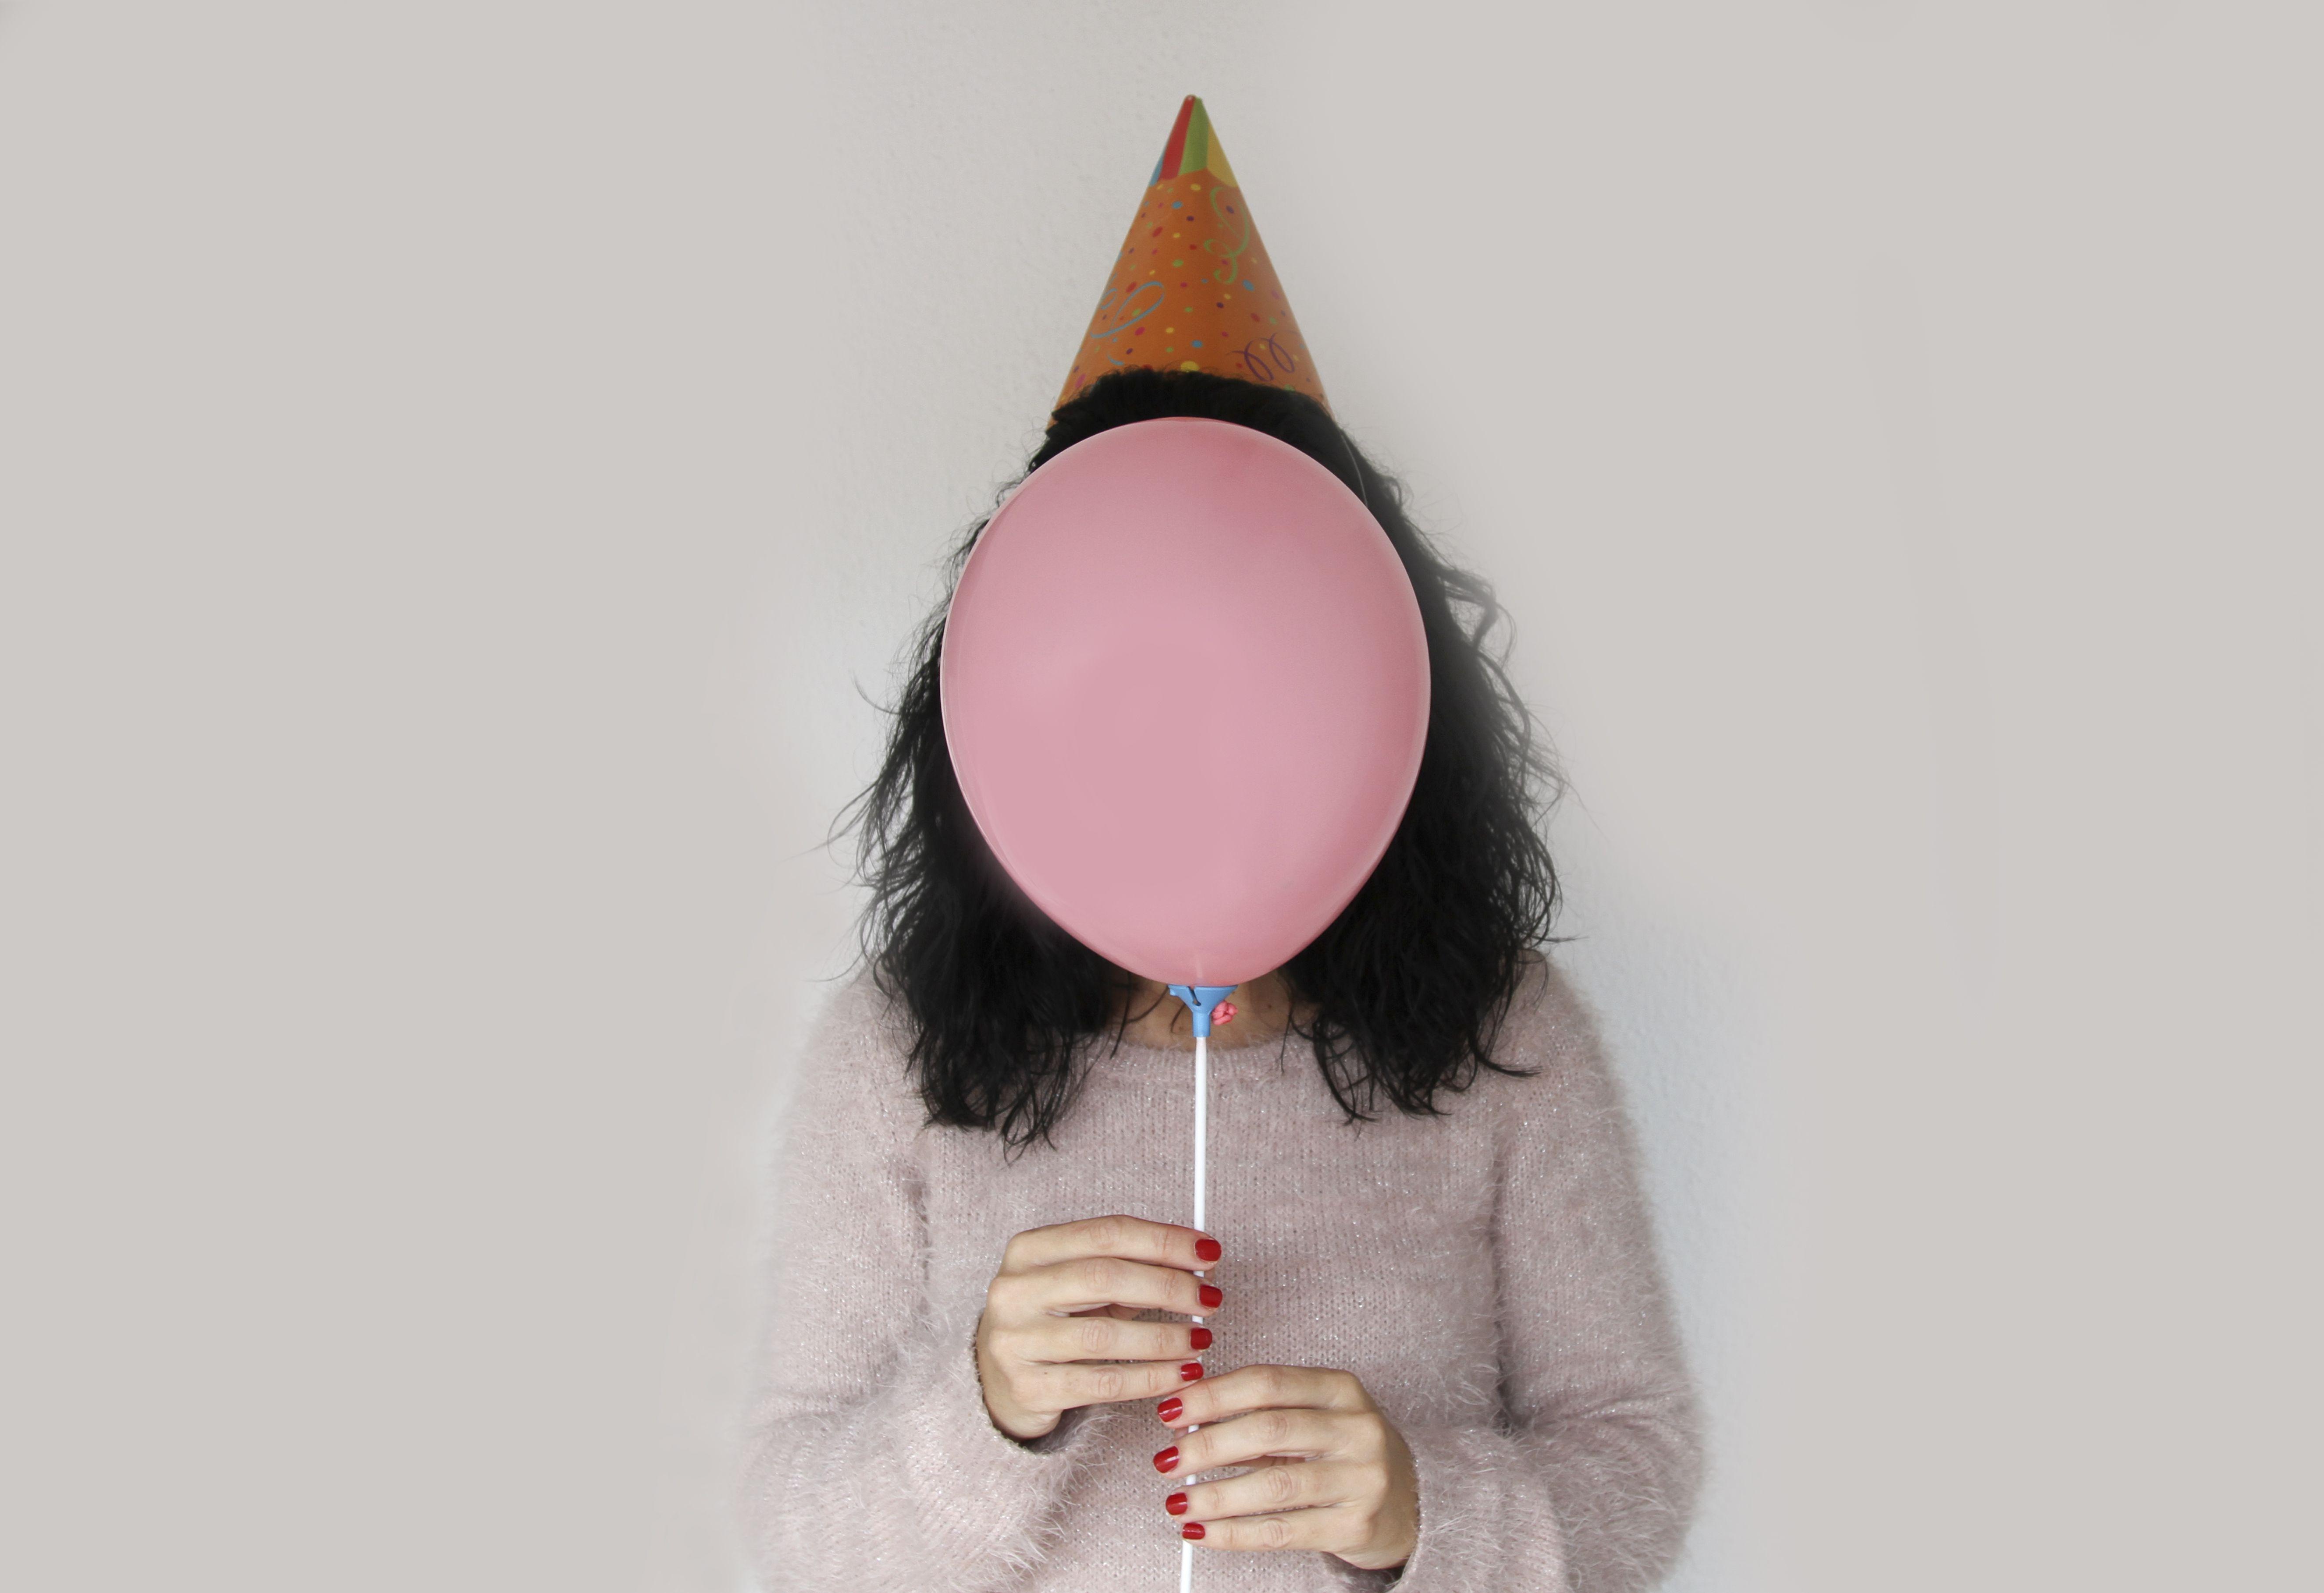 woman with balloon as face